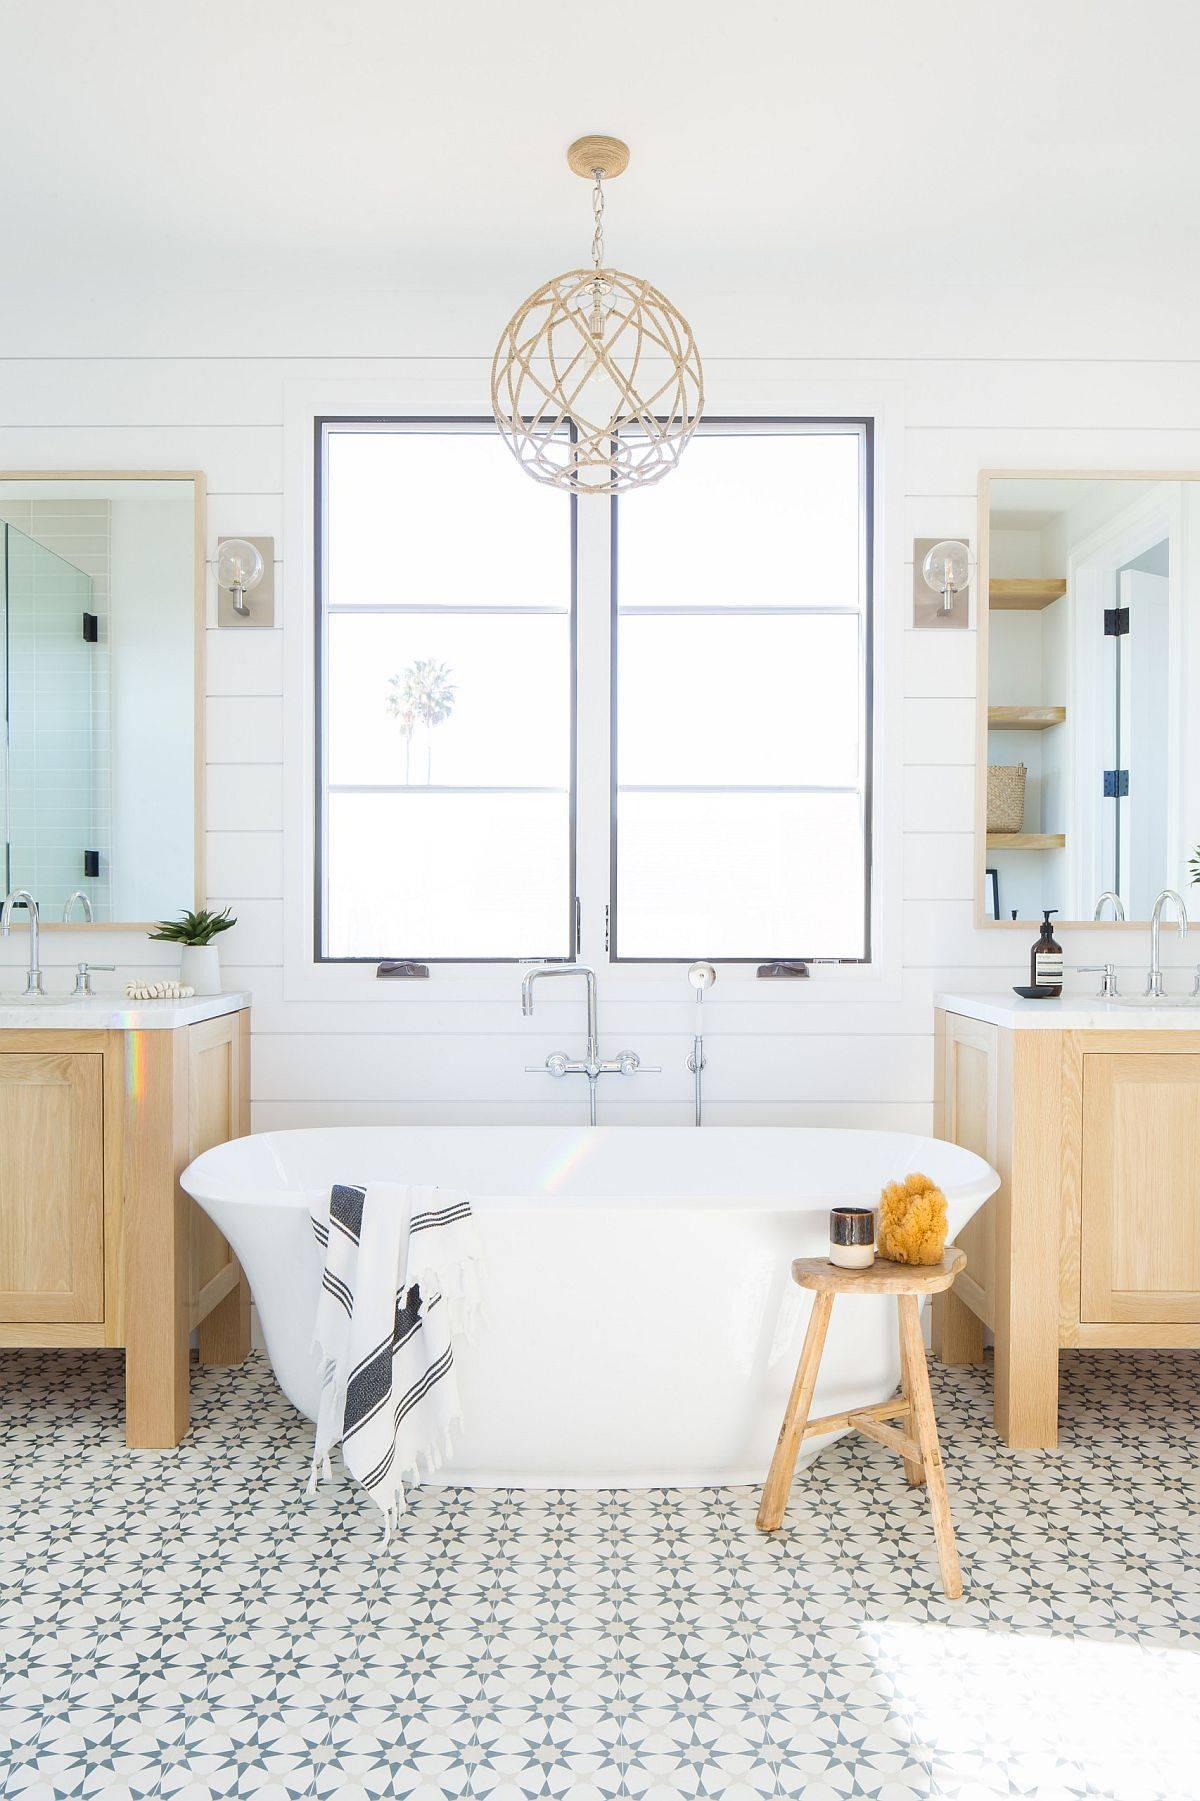 Fabulous-freestanding-bathtub-in-white-for-the-small-modern-farmhouse-bathroom-91443